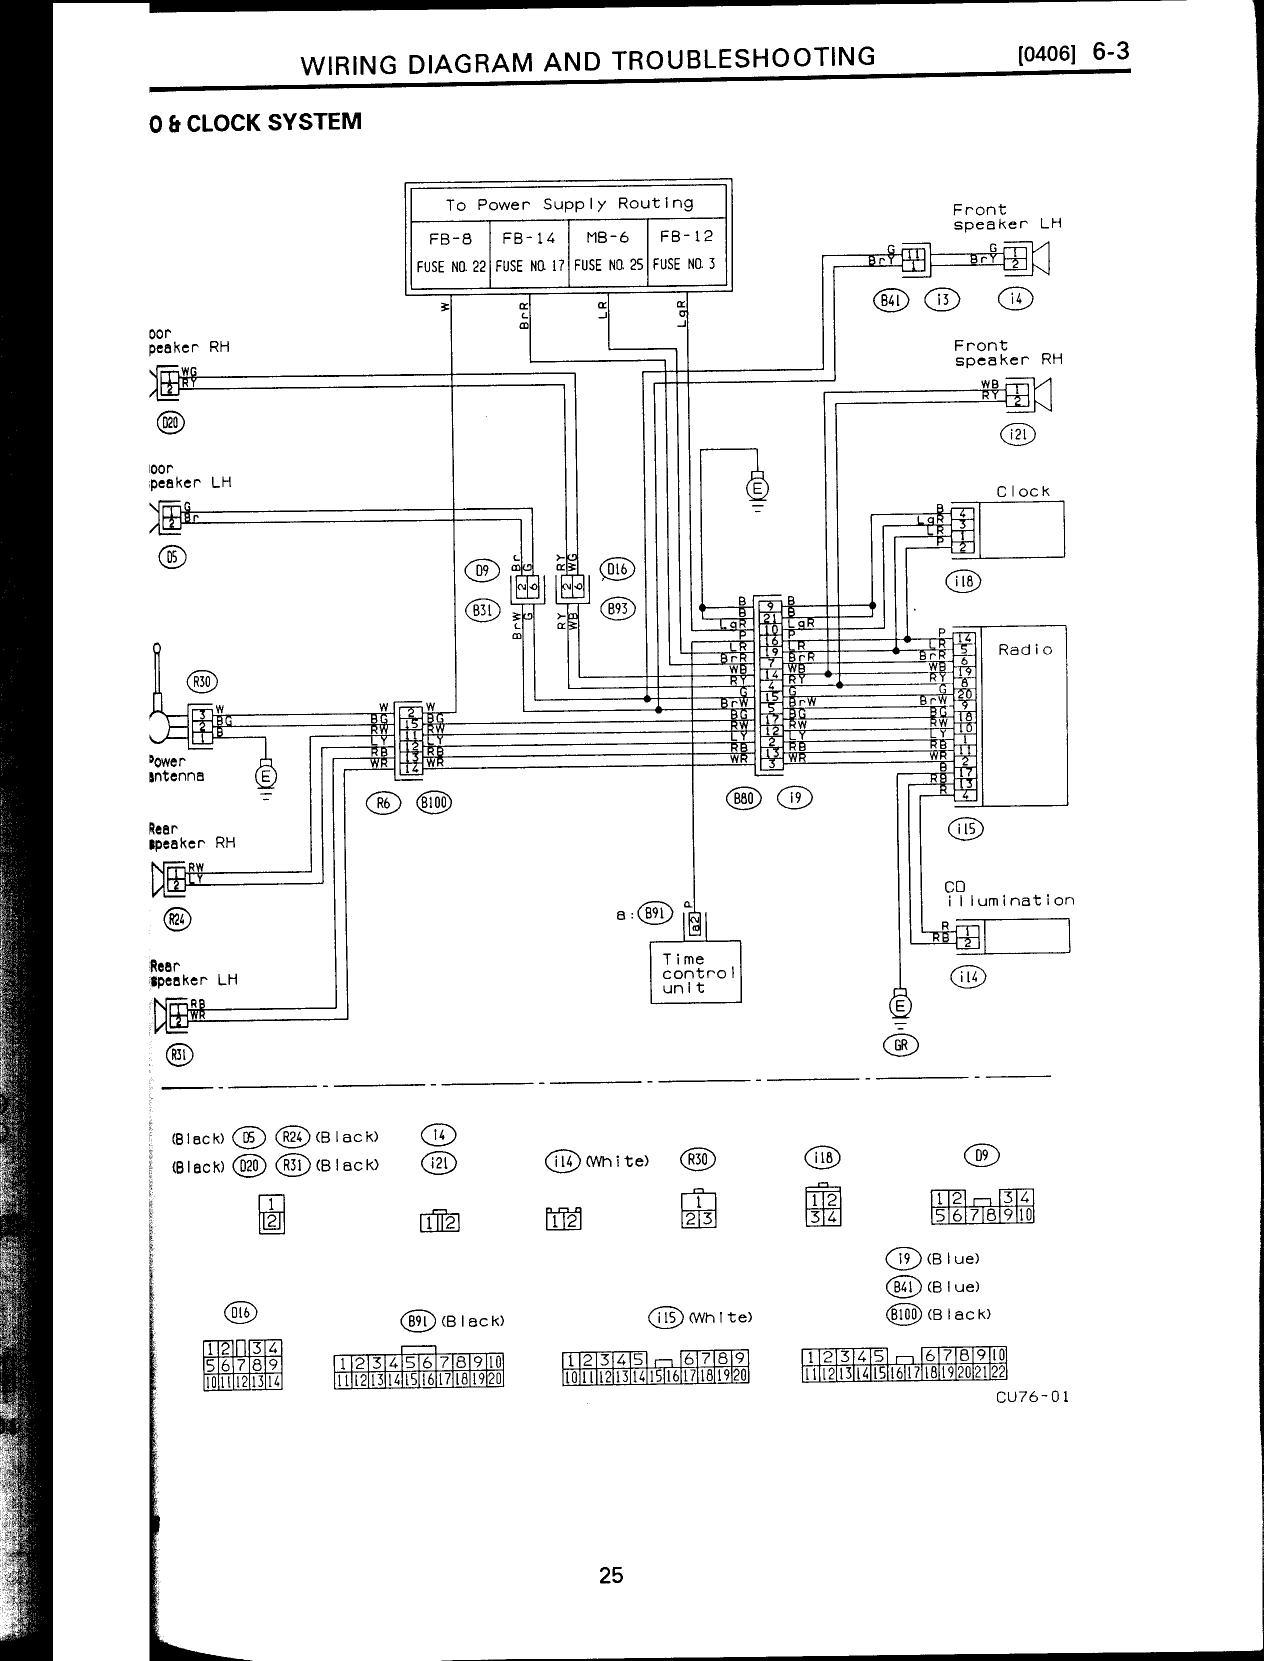 5915 subaru svx wiring harness - wiring diagram general helper | wiring  library  wiring library